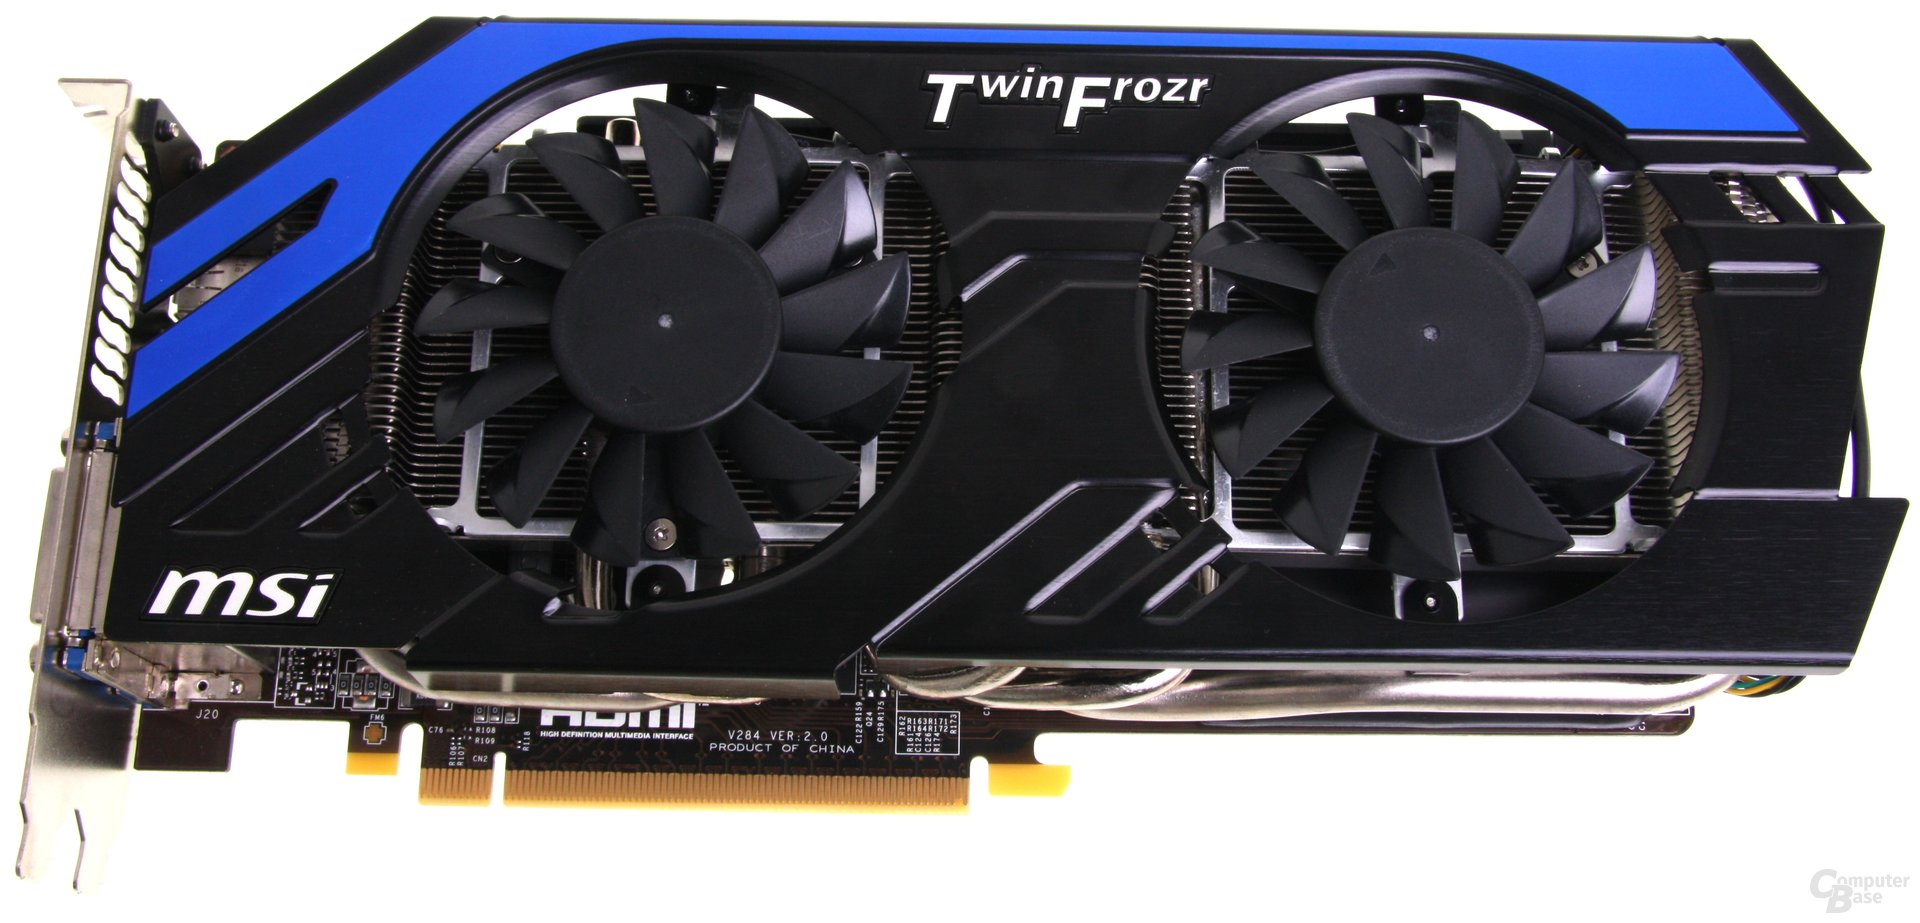 MSI GeForce GTX 670 PE OC